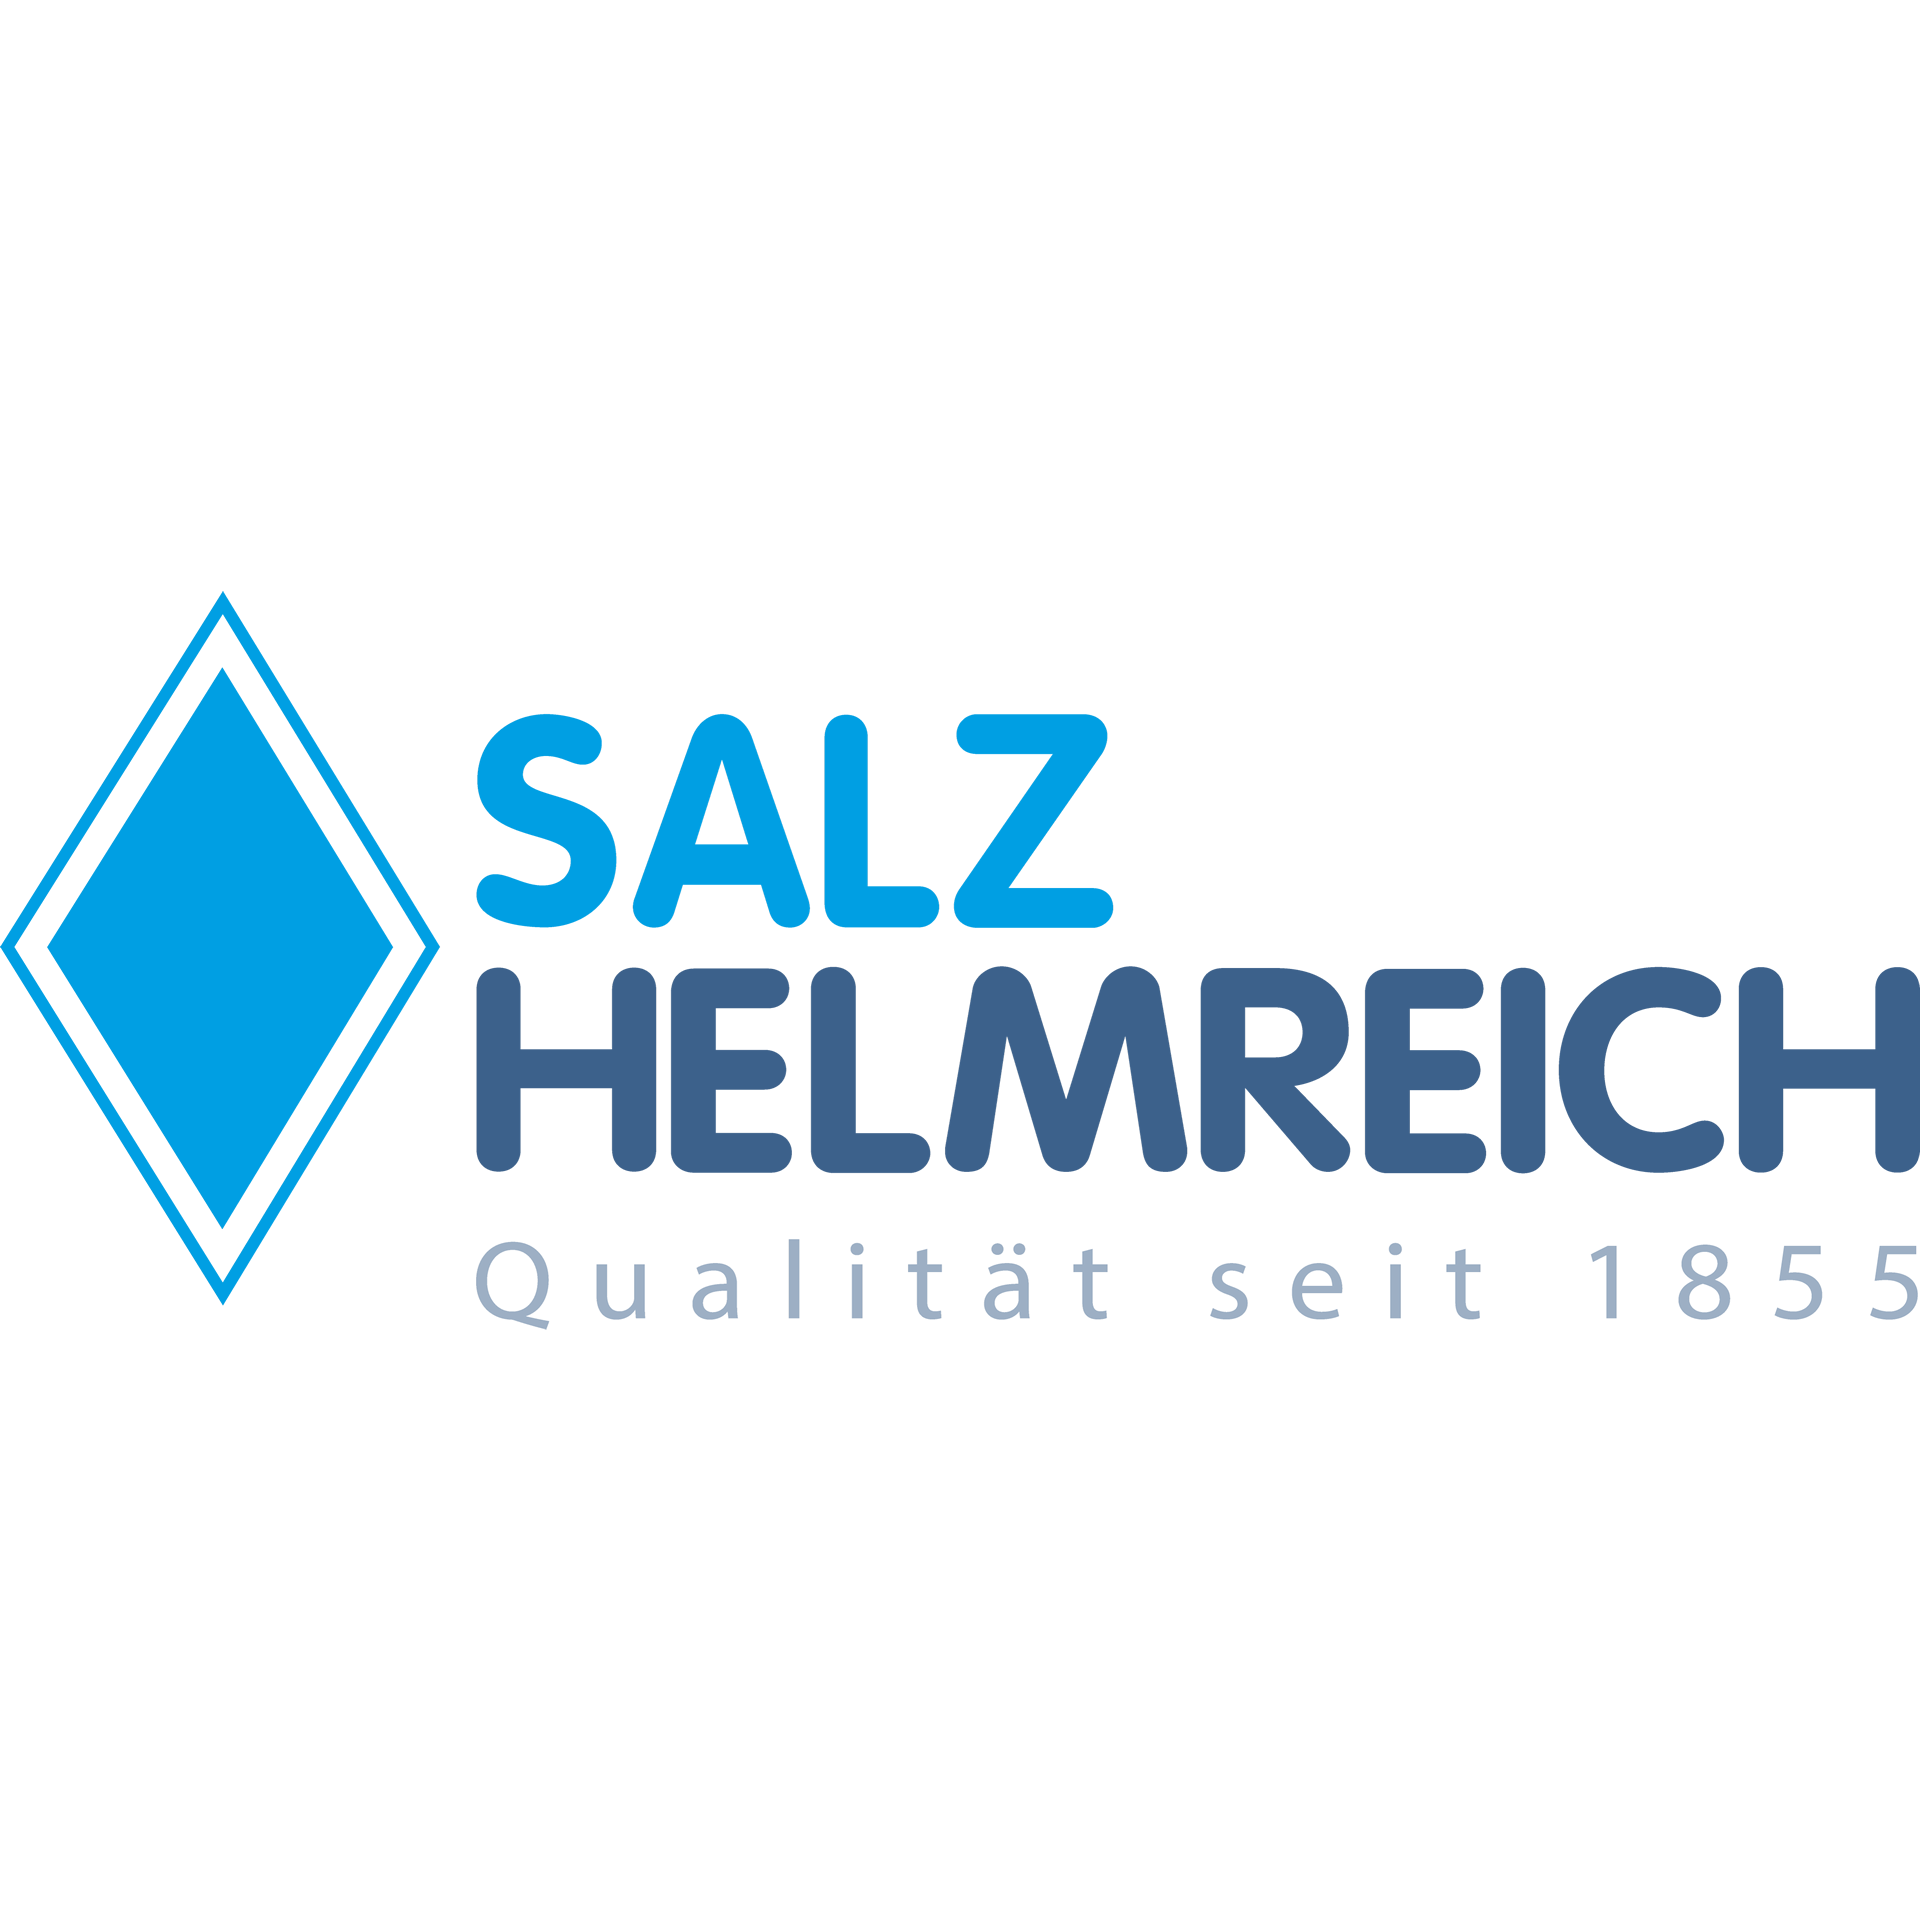 Siede - Speisesalz Calibrated 0,13-0,4mm im 25kg Sack